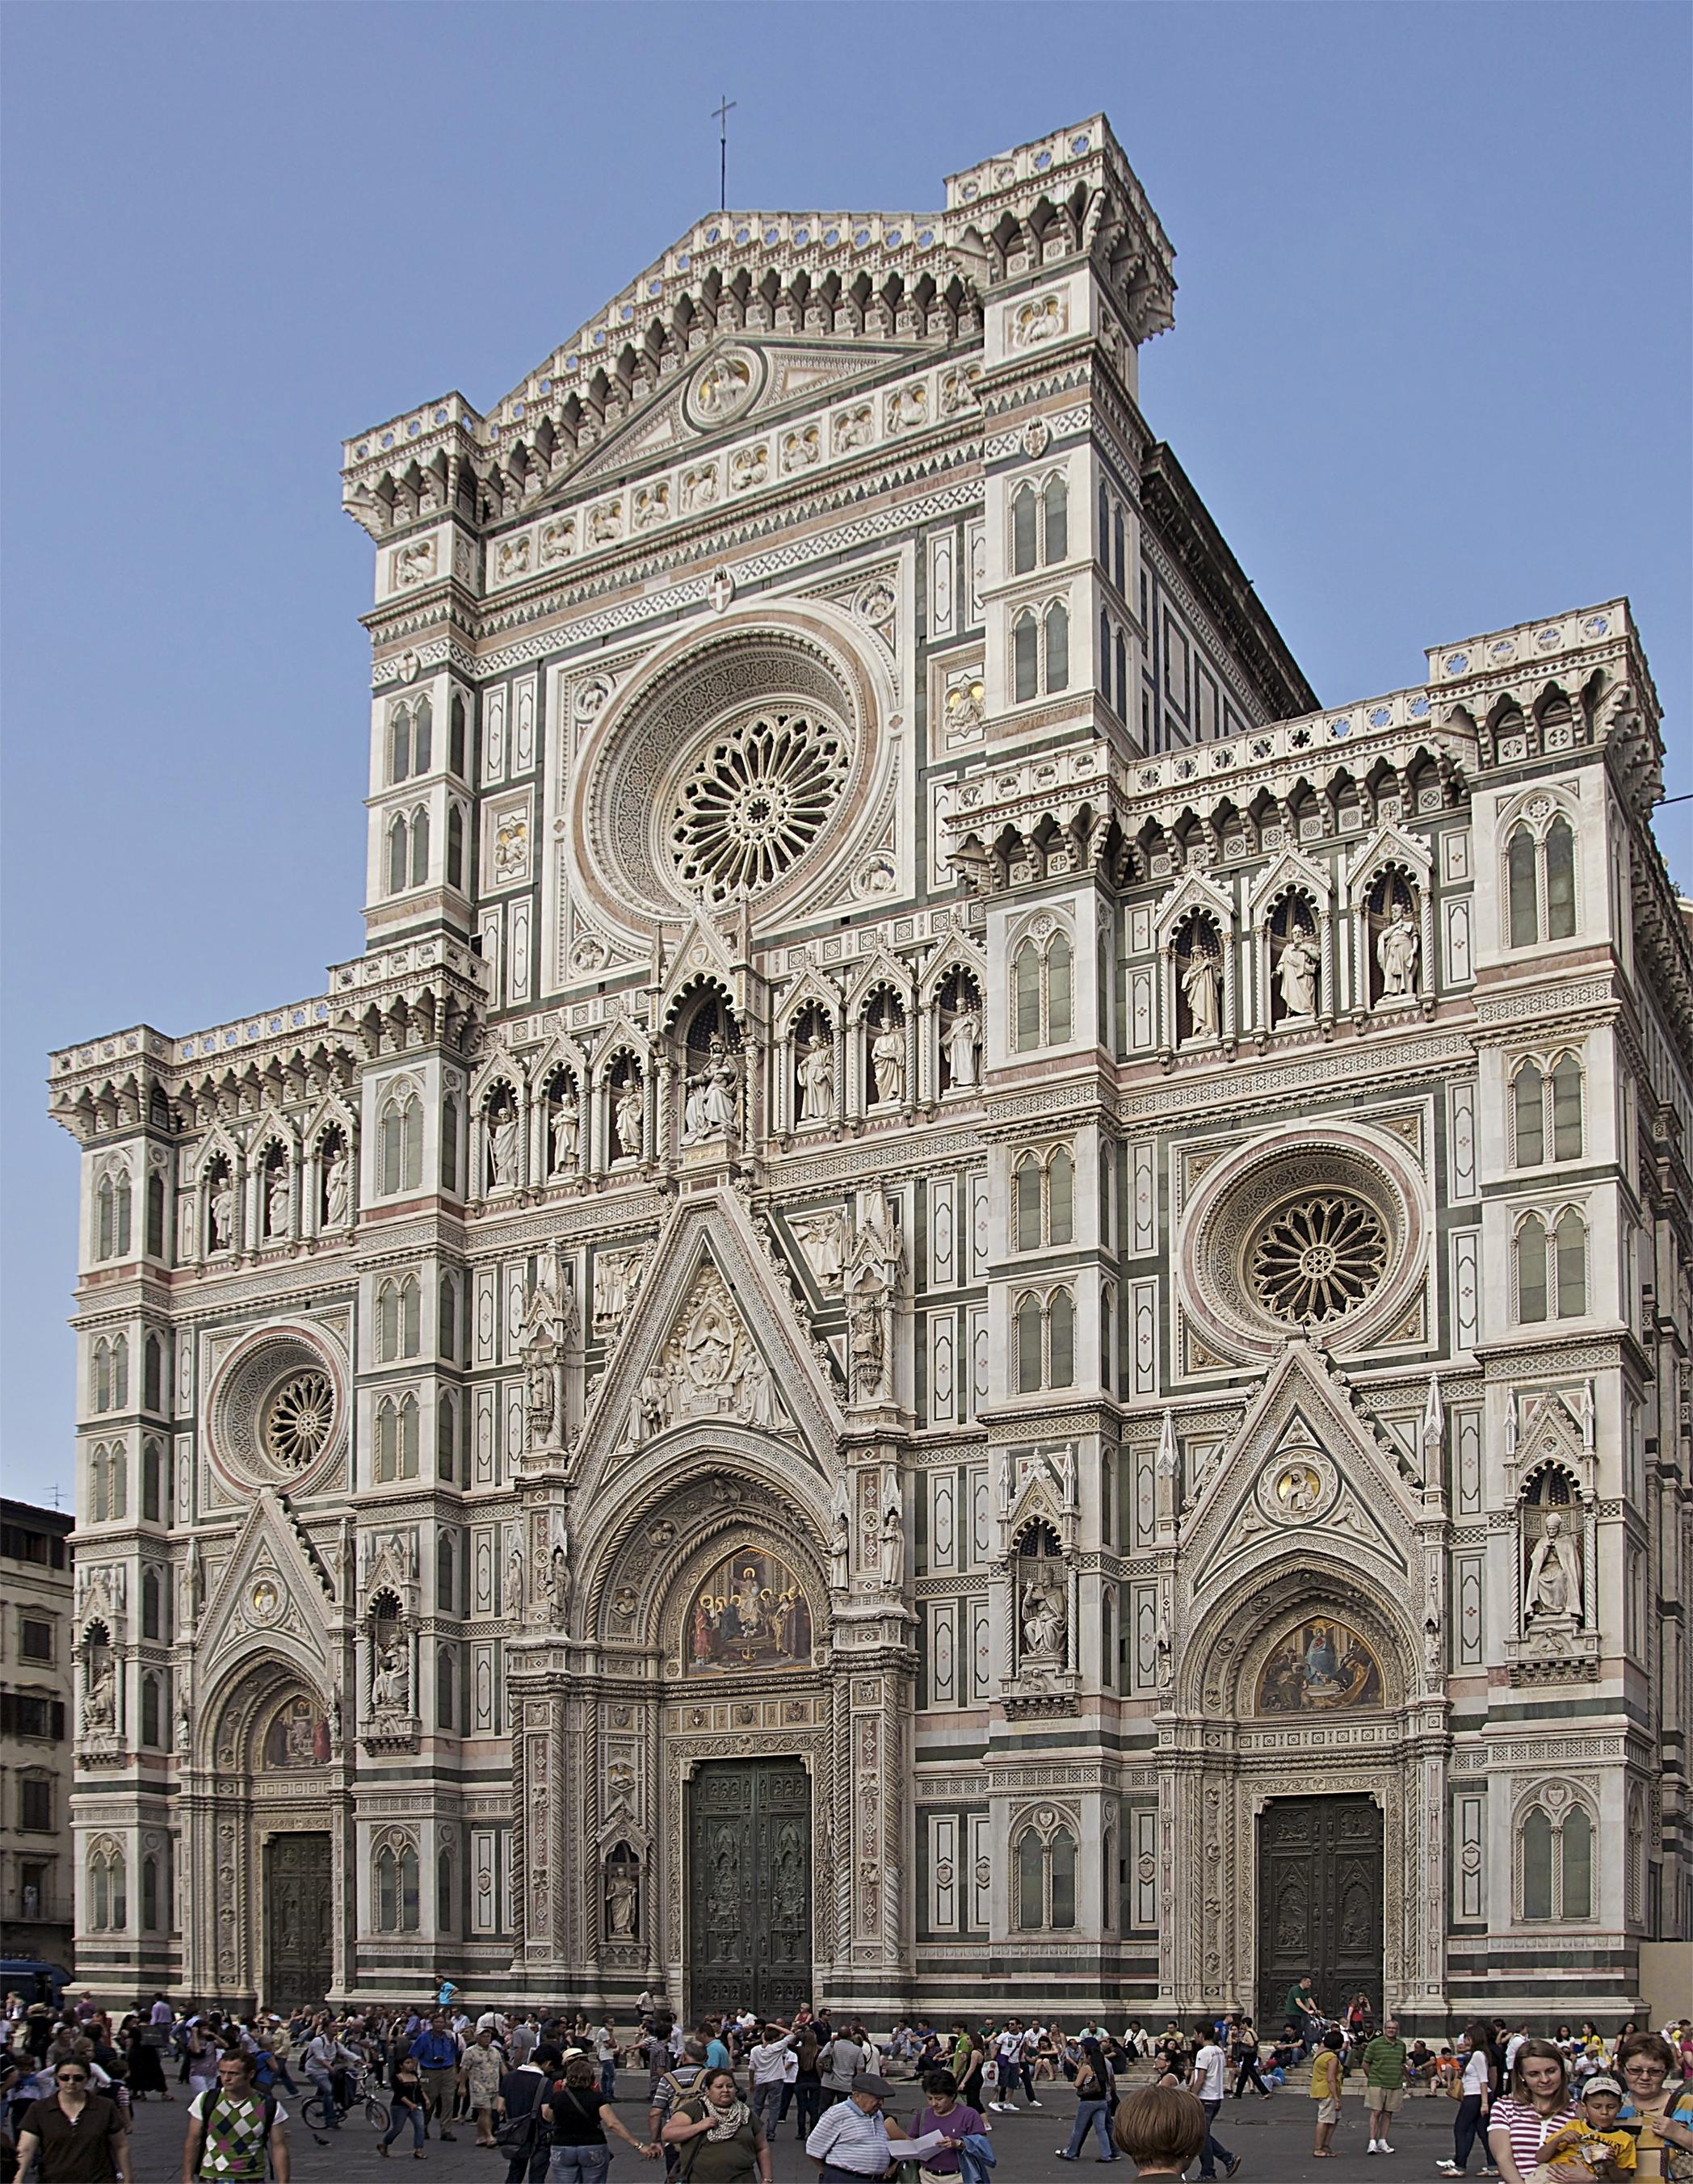 File:Façade cathédrale Florence.jpg - Wikimedia Commons